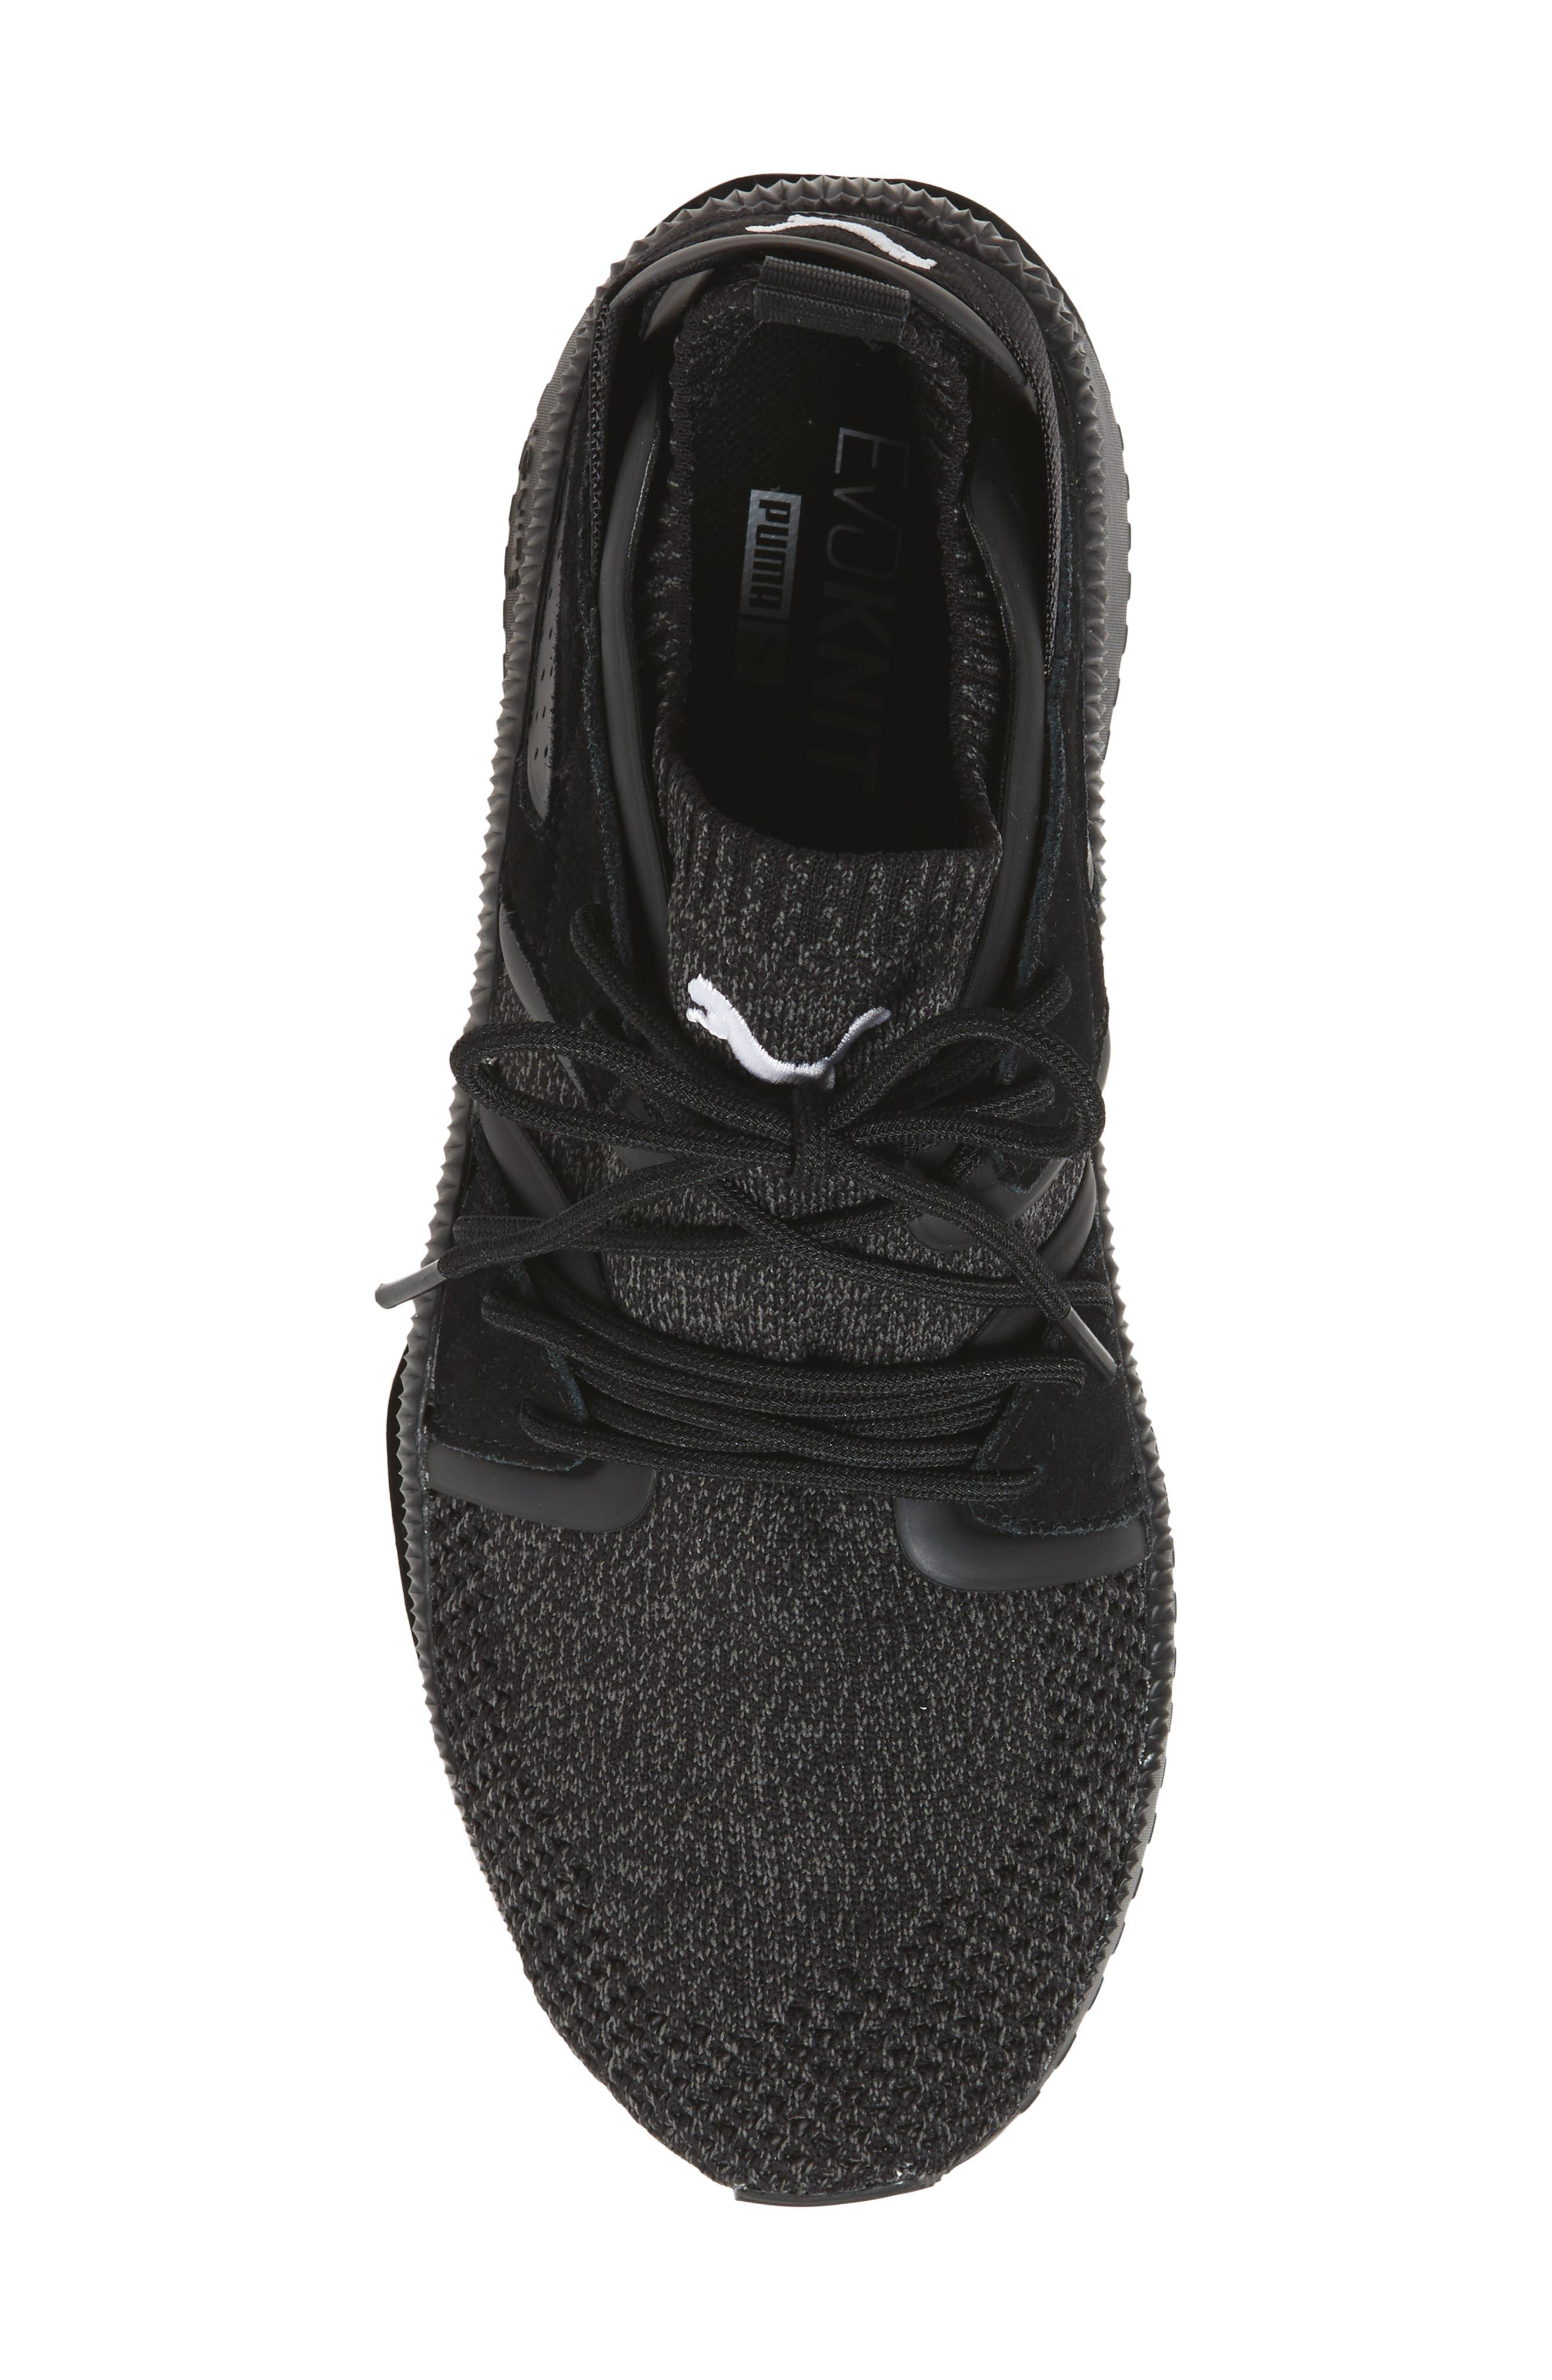 Tsugi Blaze EvoKnit Sneaker,                             Alternate thumbnail 5, color,